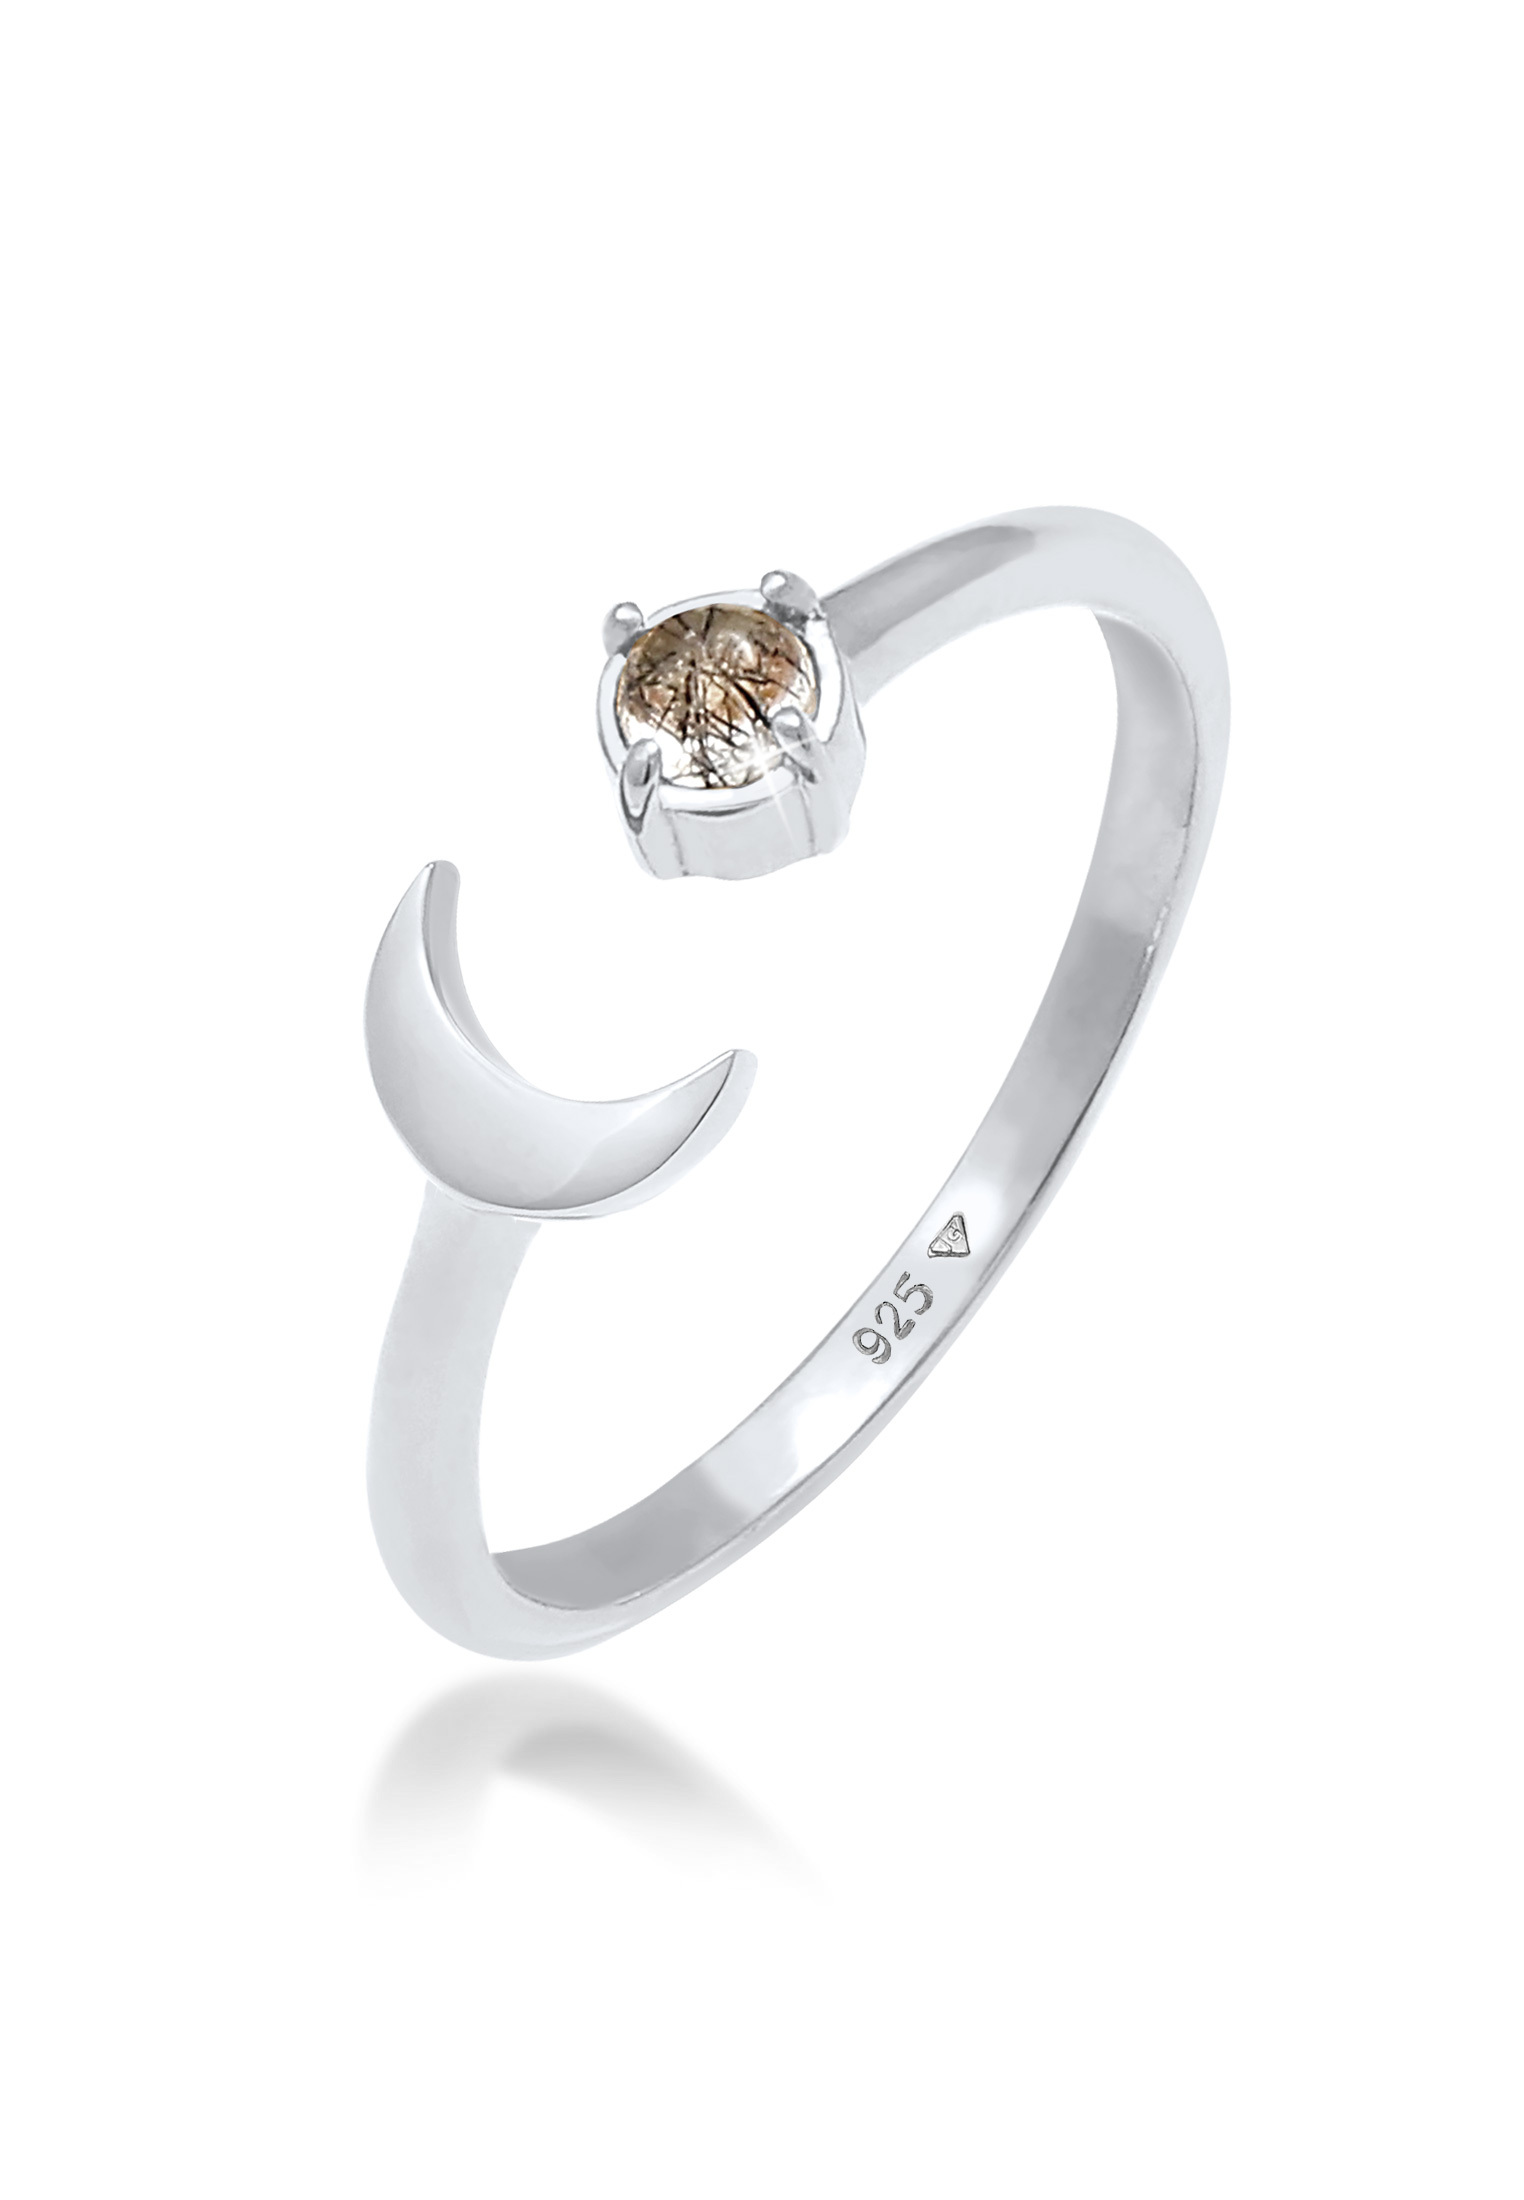 Ring Astro   Quarz ( Transparent )   925er Sterling Silber